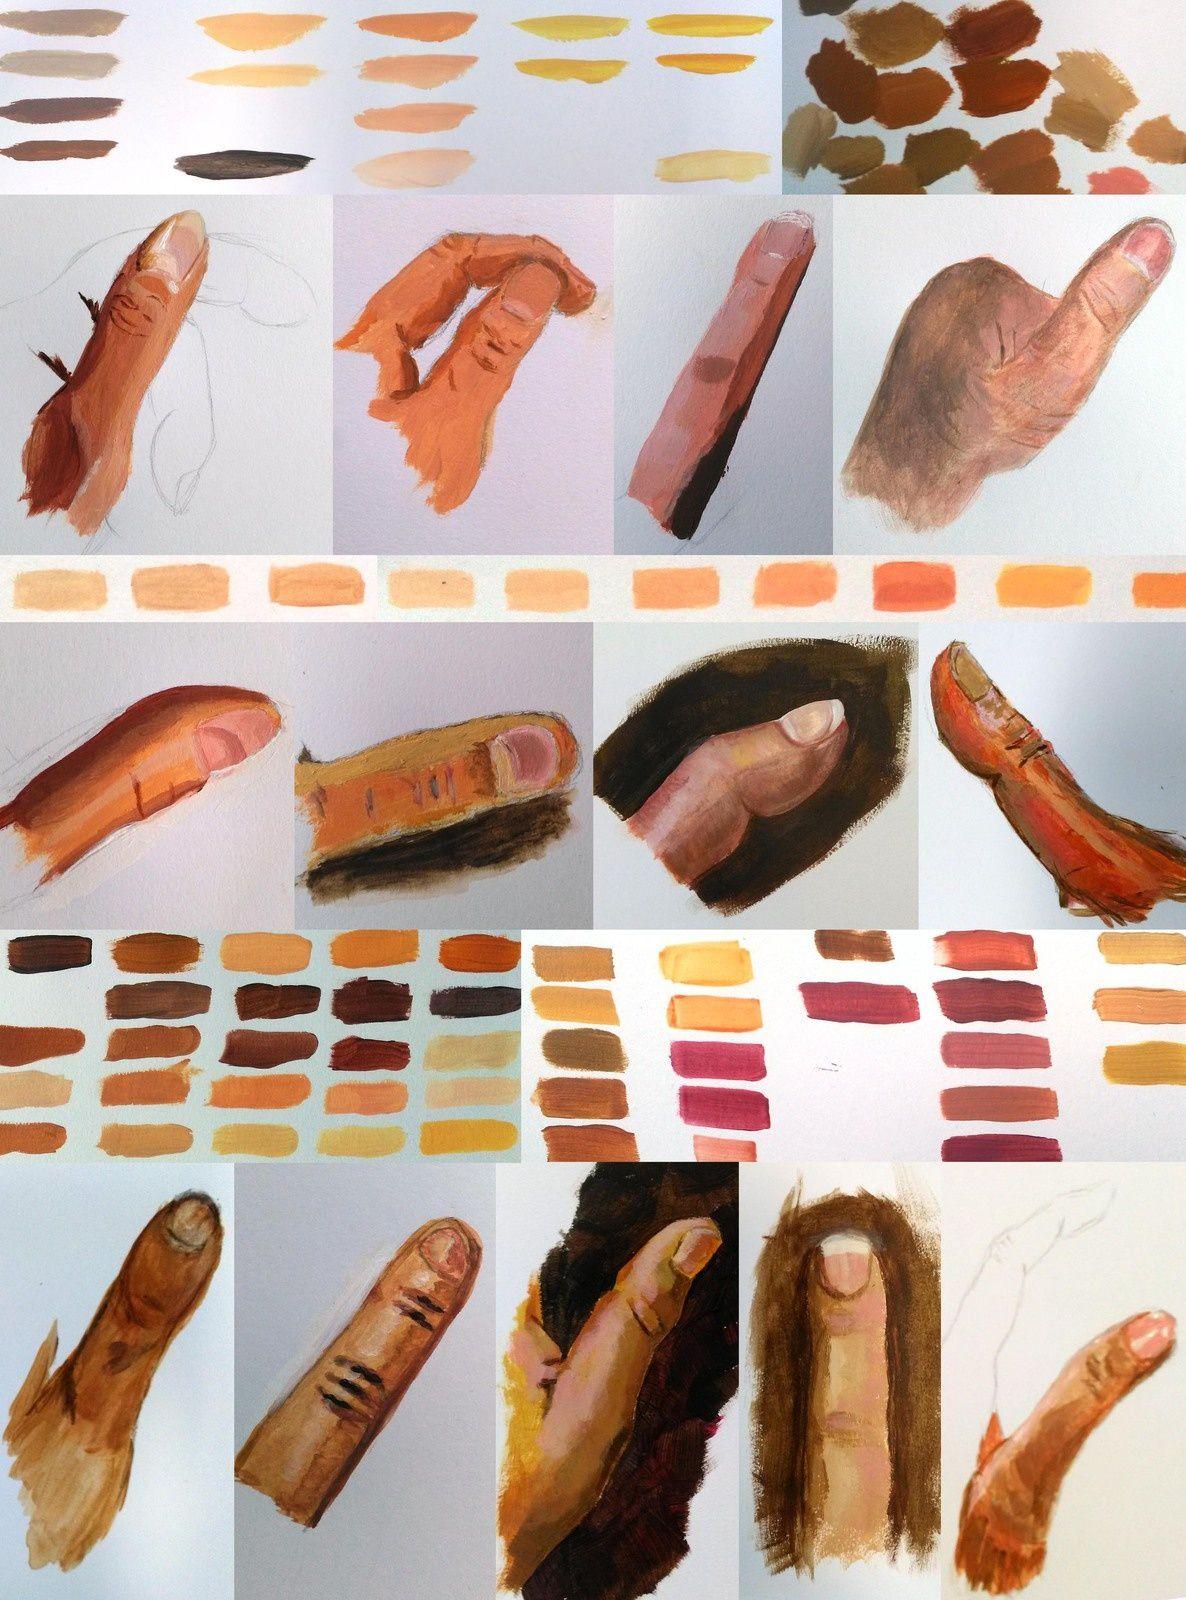 Couleurs de peau   Couleur de peau, Couleur, Peau